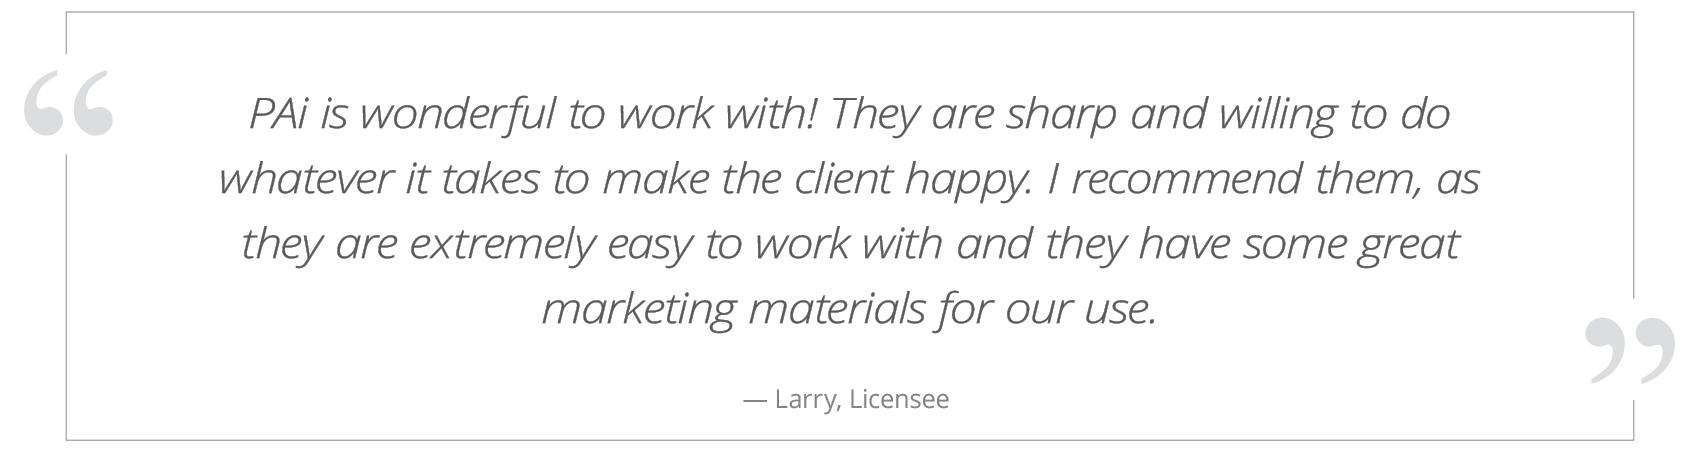 pai-website-testimonial-Larry-Payroll.png